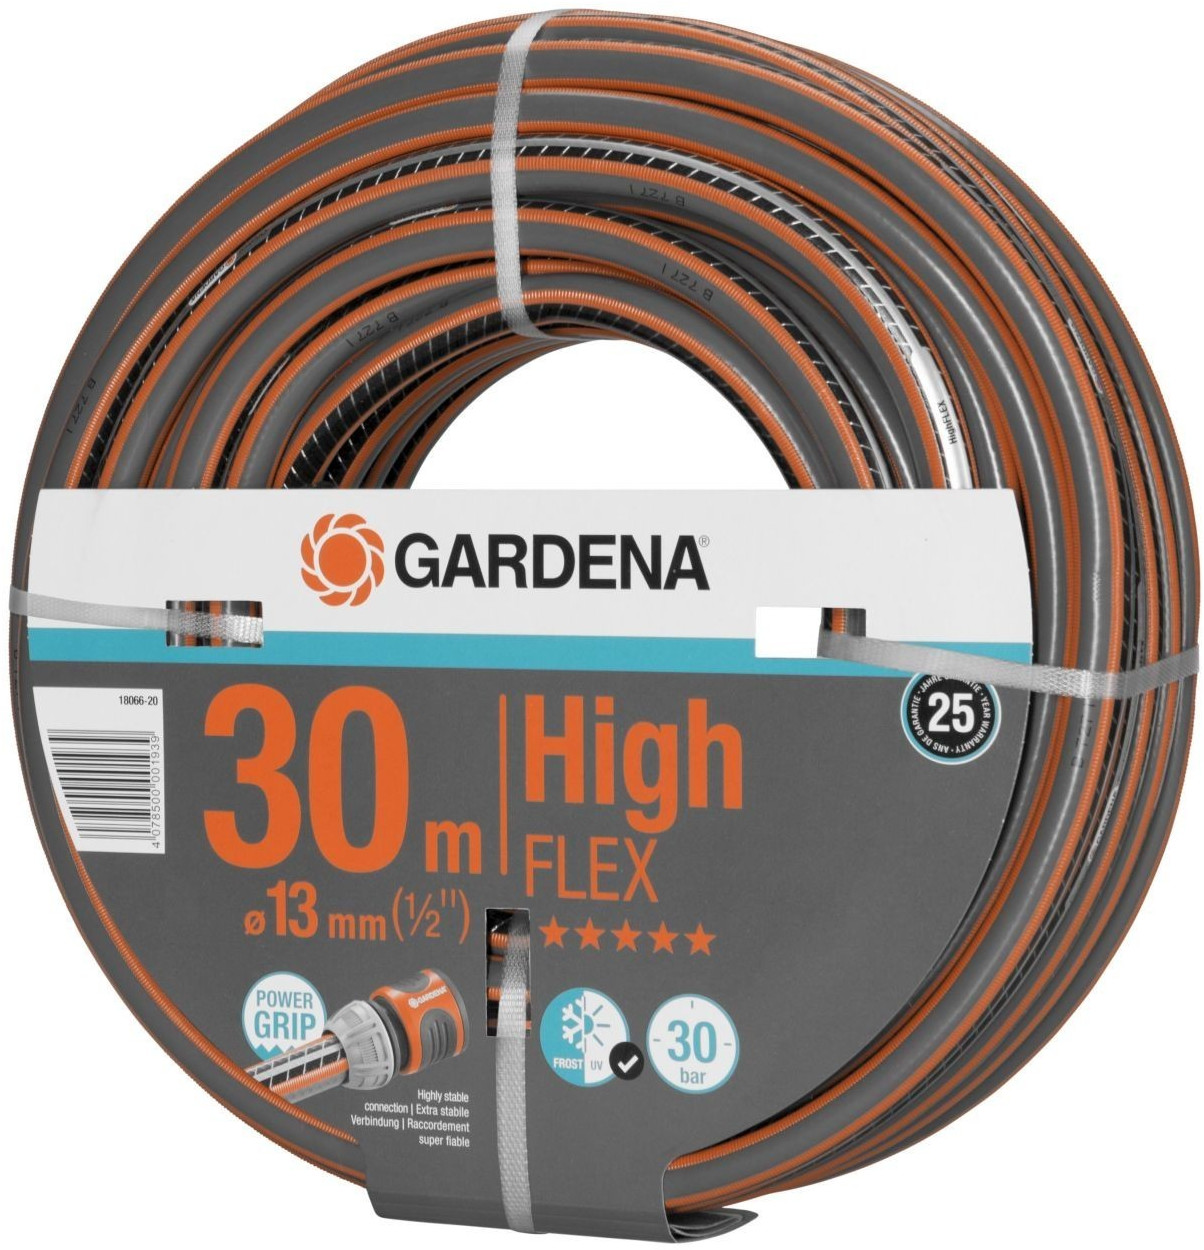 "Gardena PVC-Schlauch Comfort HighFlex 1/2"" - 30 m (18066-20)"